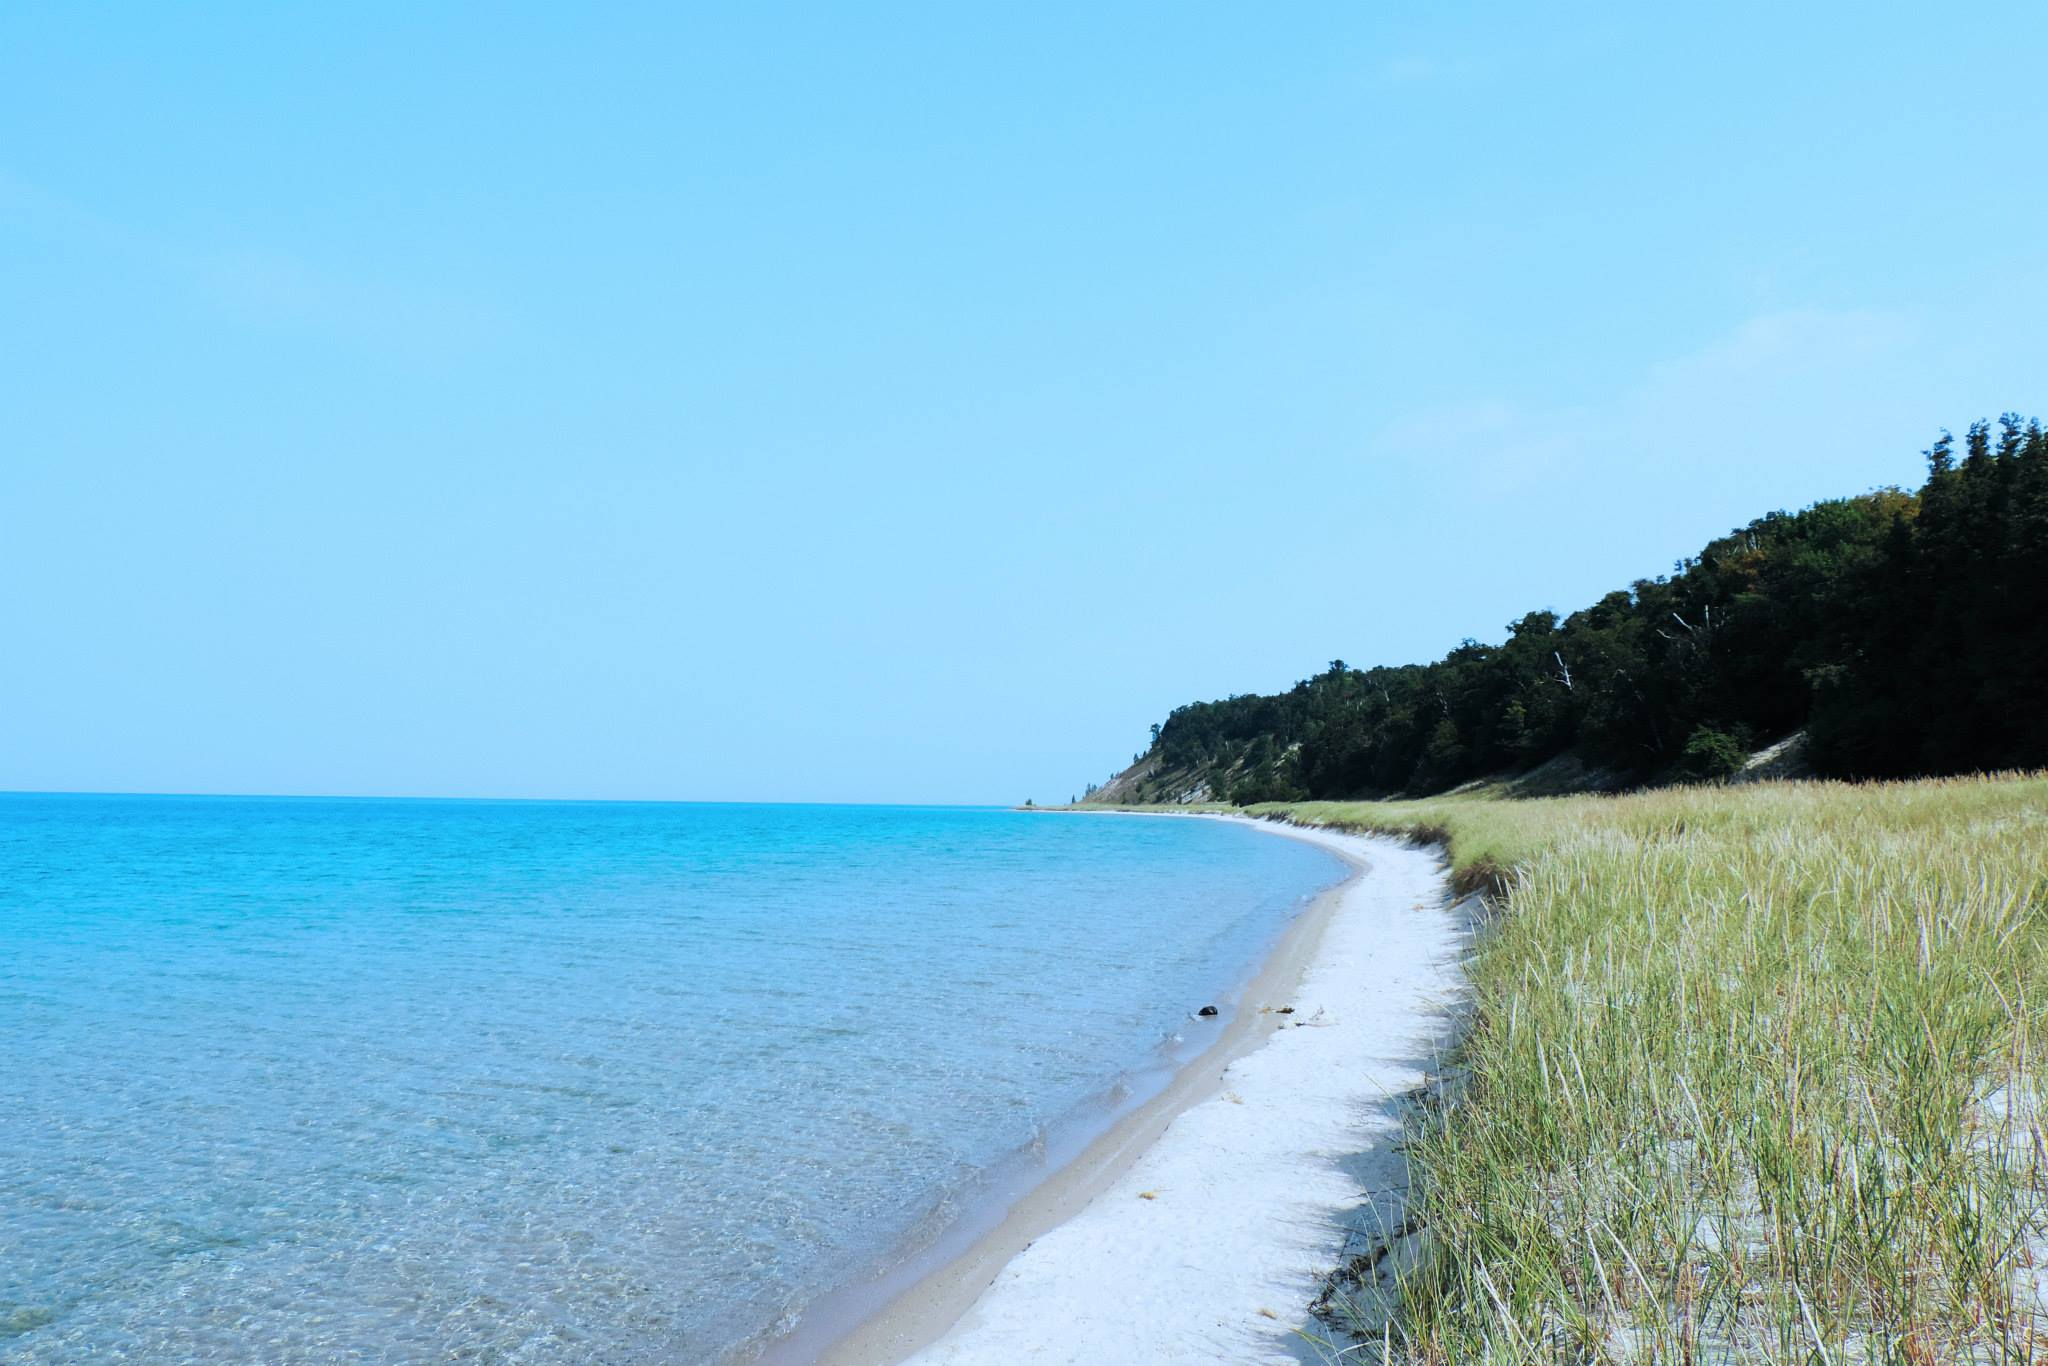 North Manitou Beach